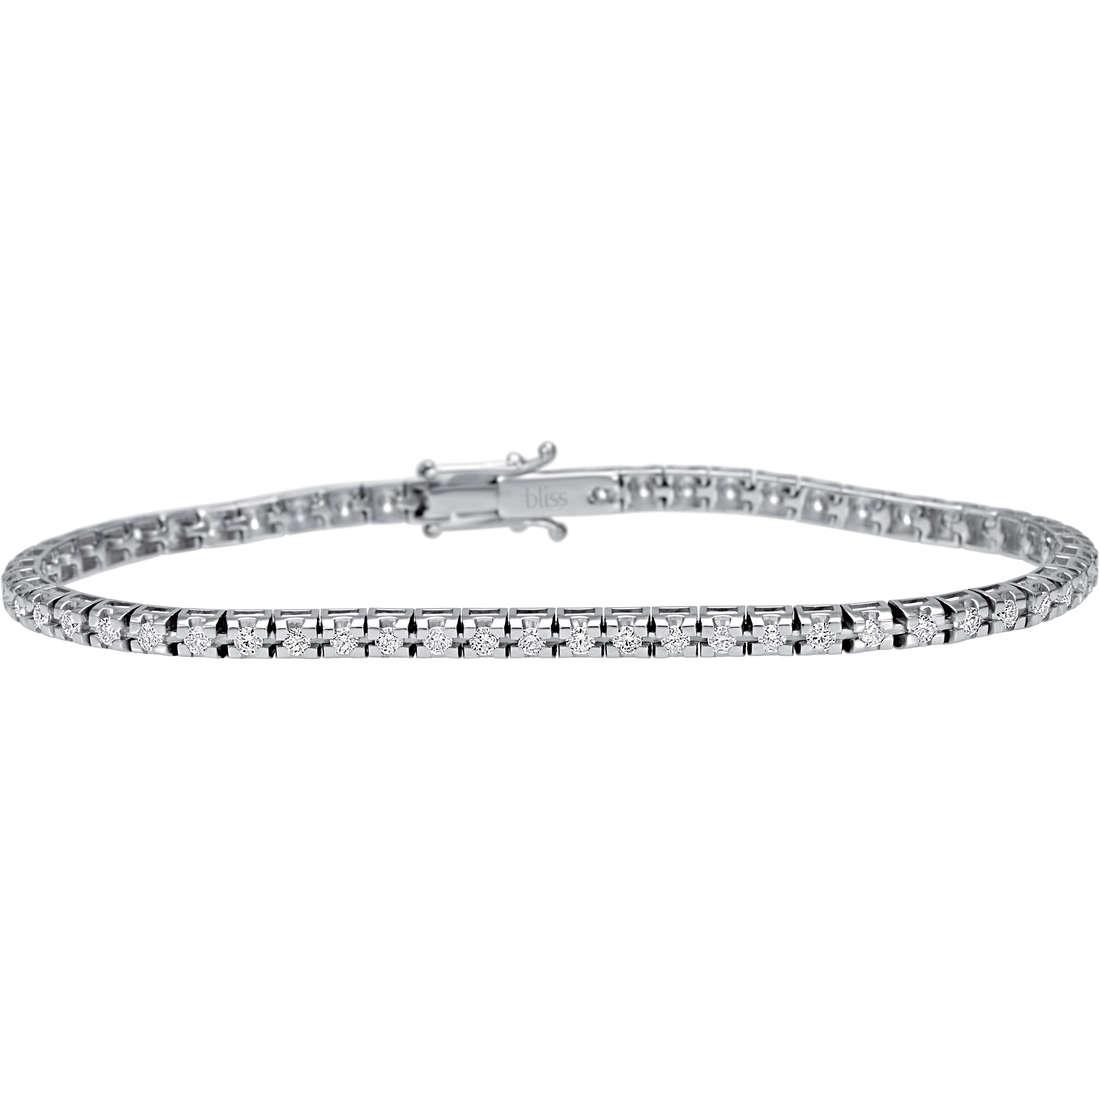 bracelet woman jewellery Bliss First class 20061016